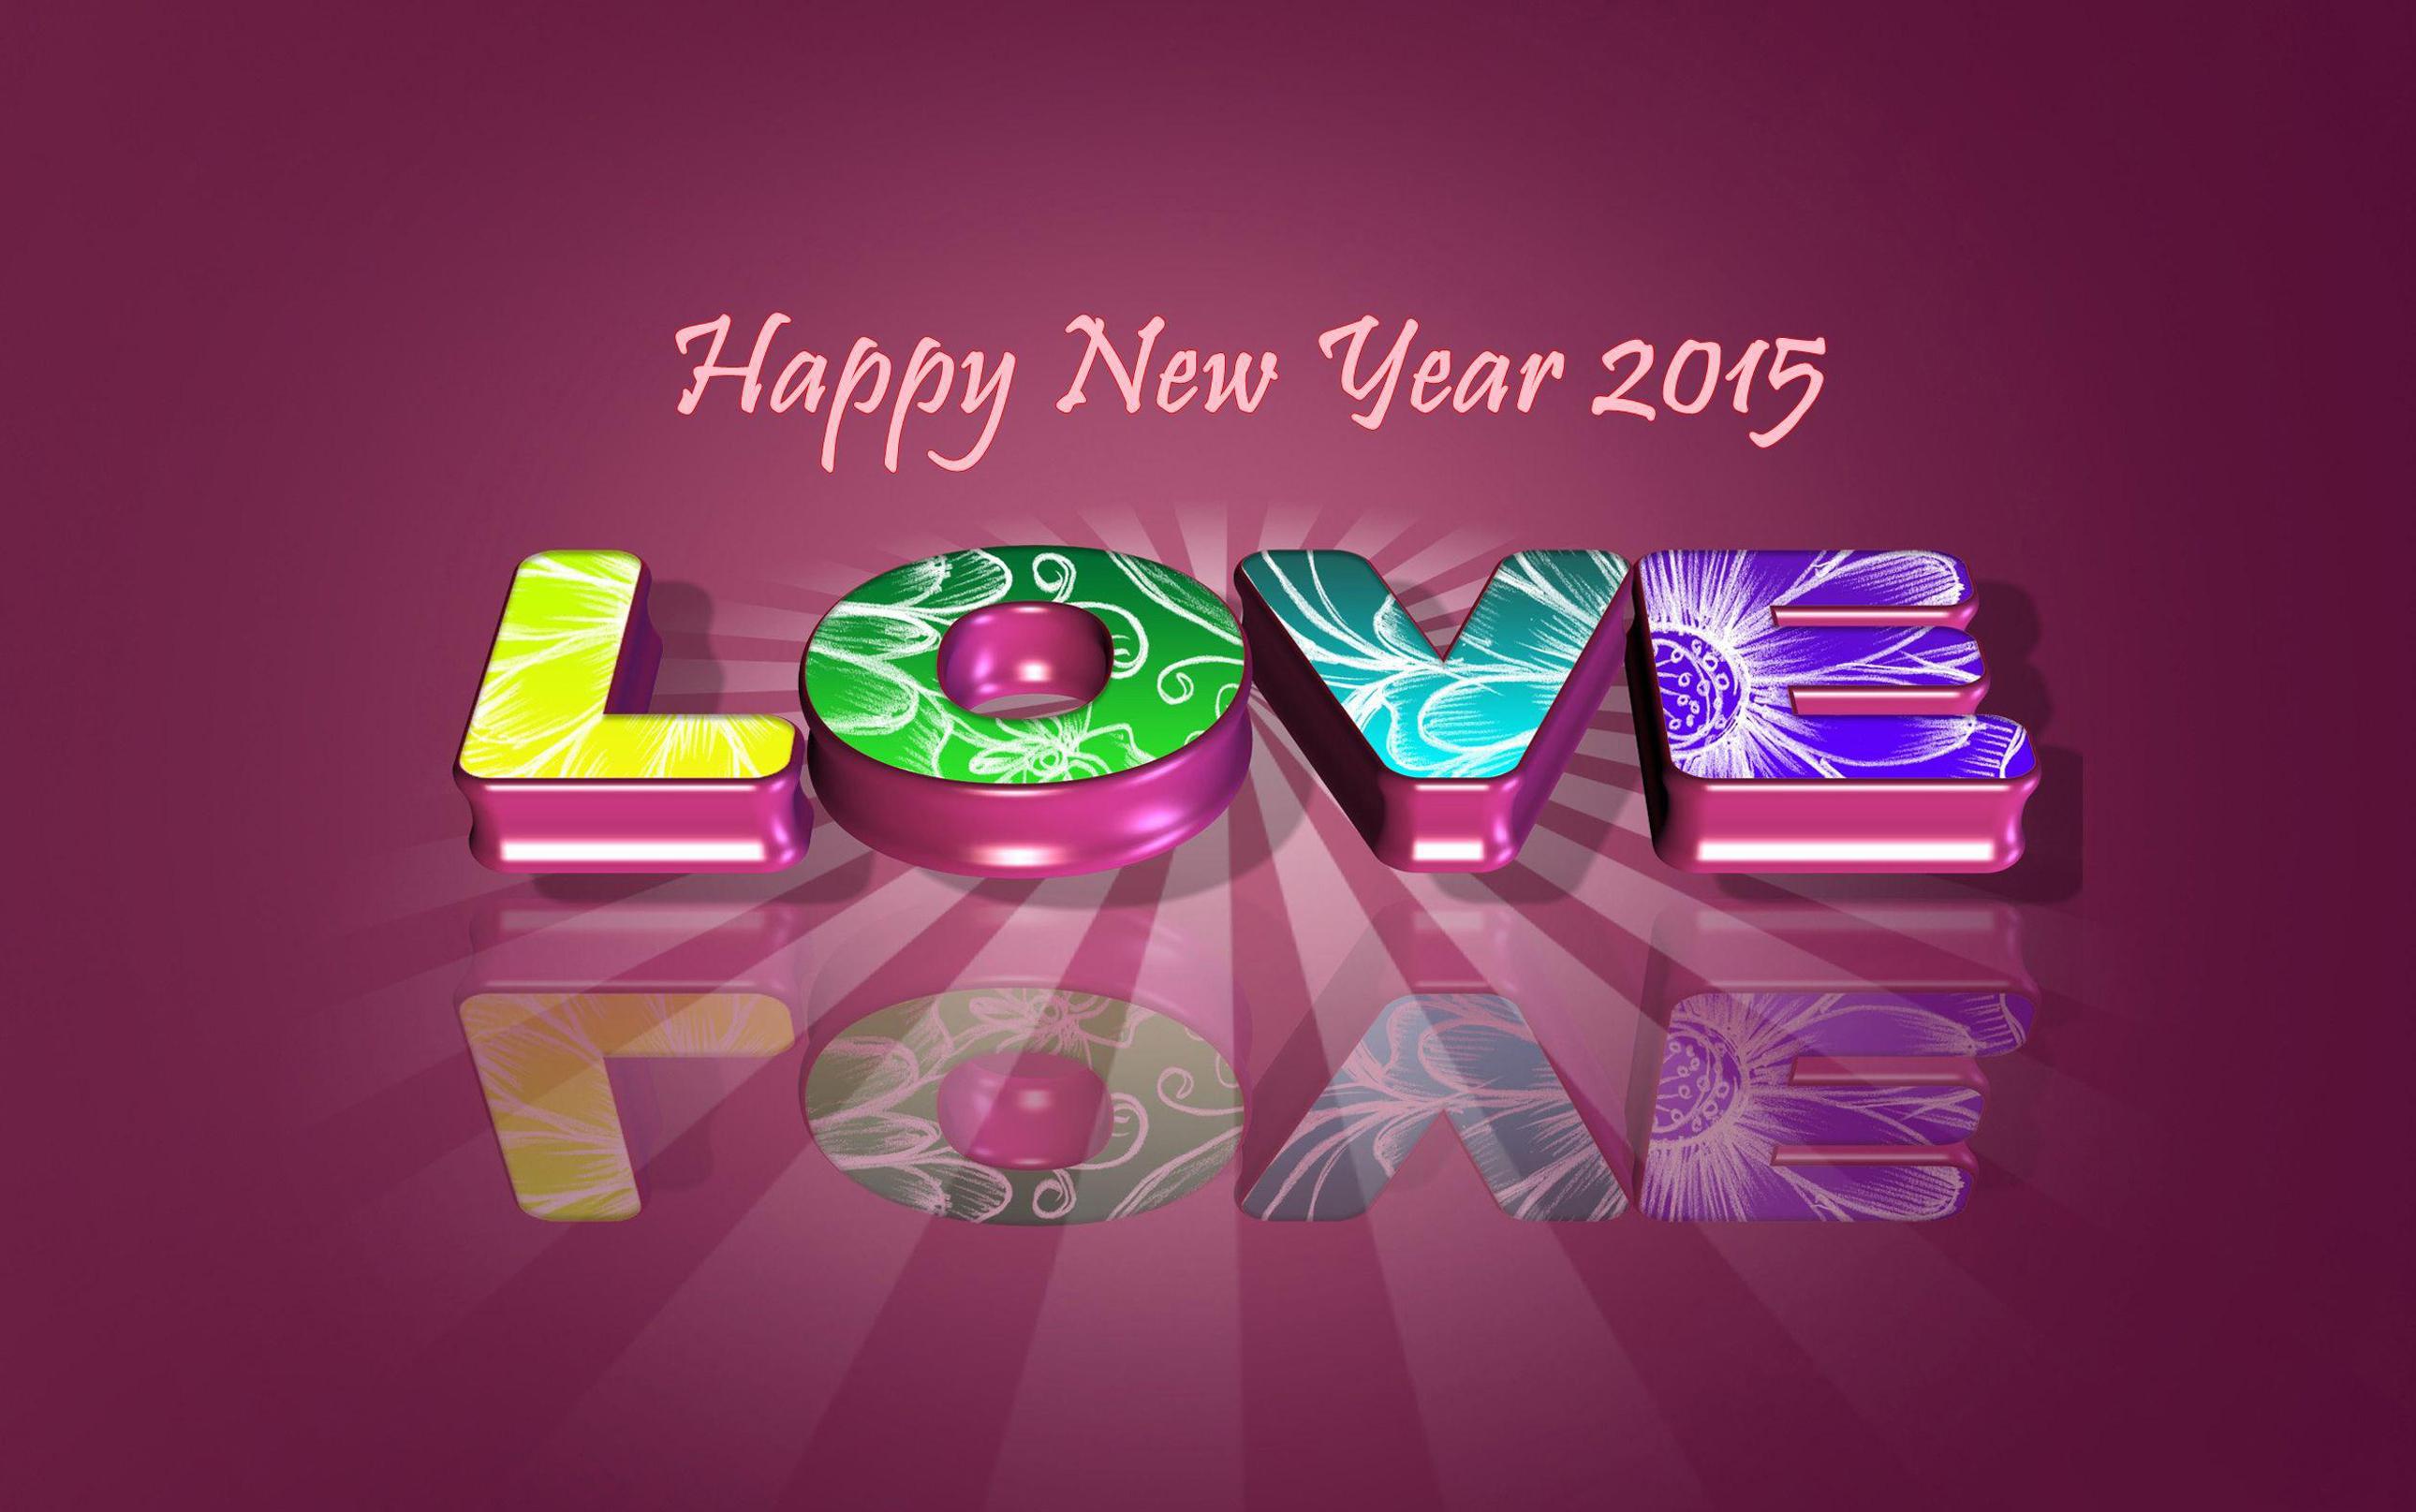 love happy new year 2015 wallpaper 2580x1615